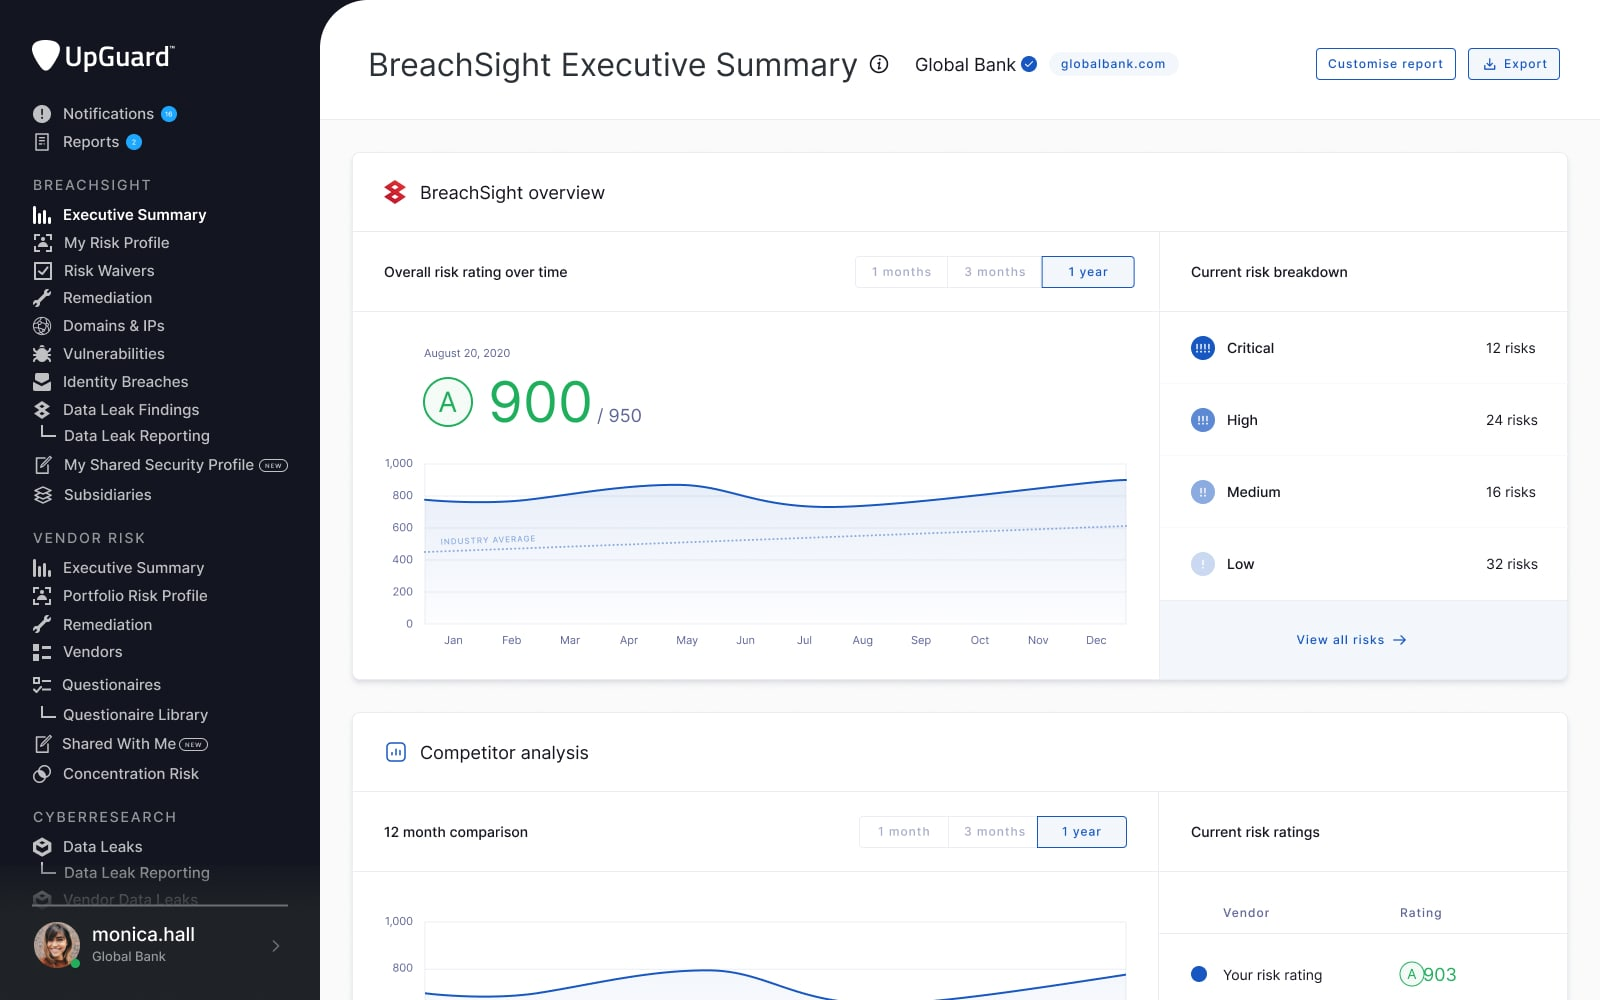 UpGuard BreachSight Customer